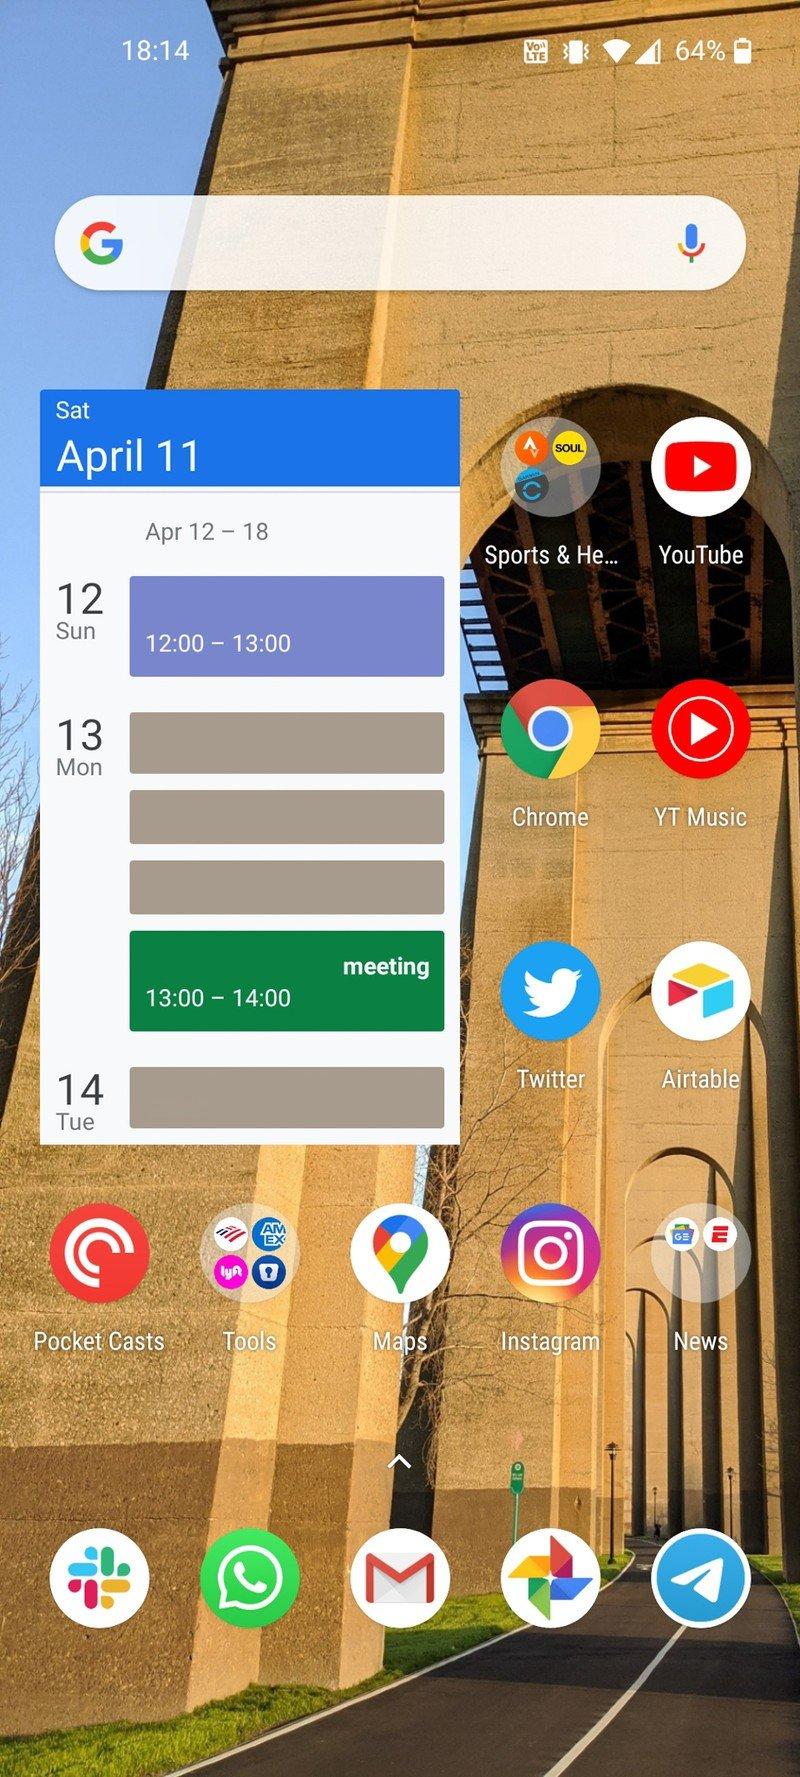 screenshot_20200411-181455.jpg?itok=Hlud